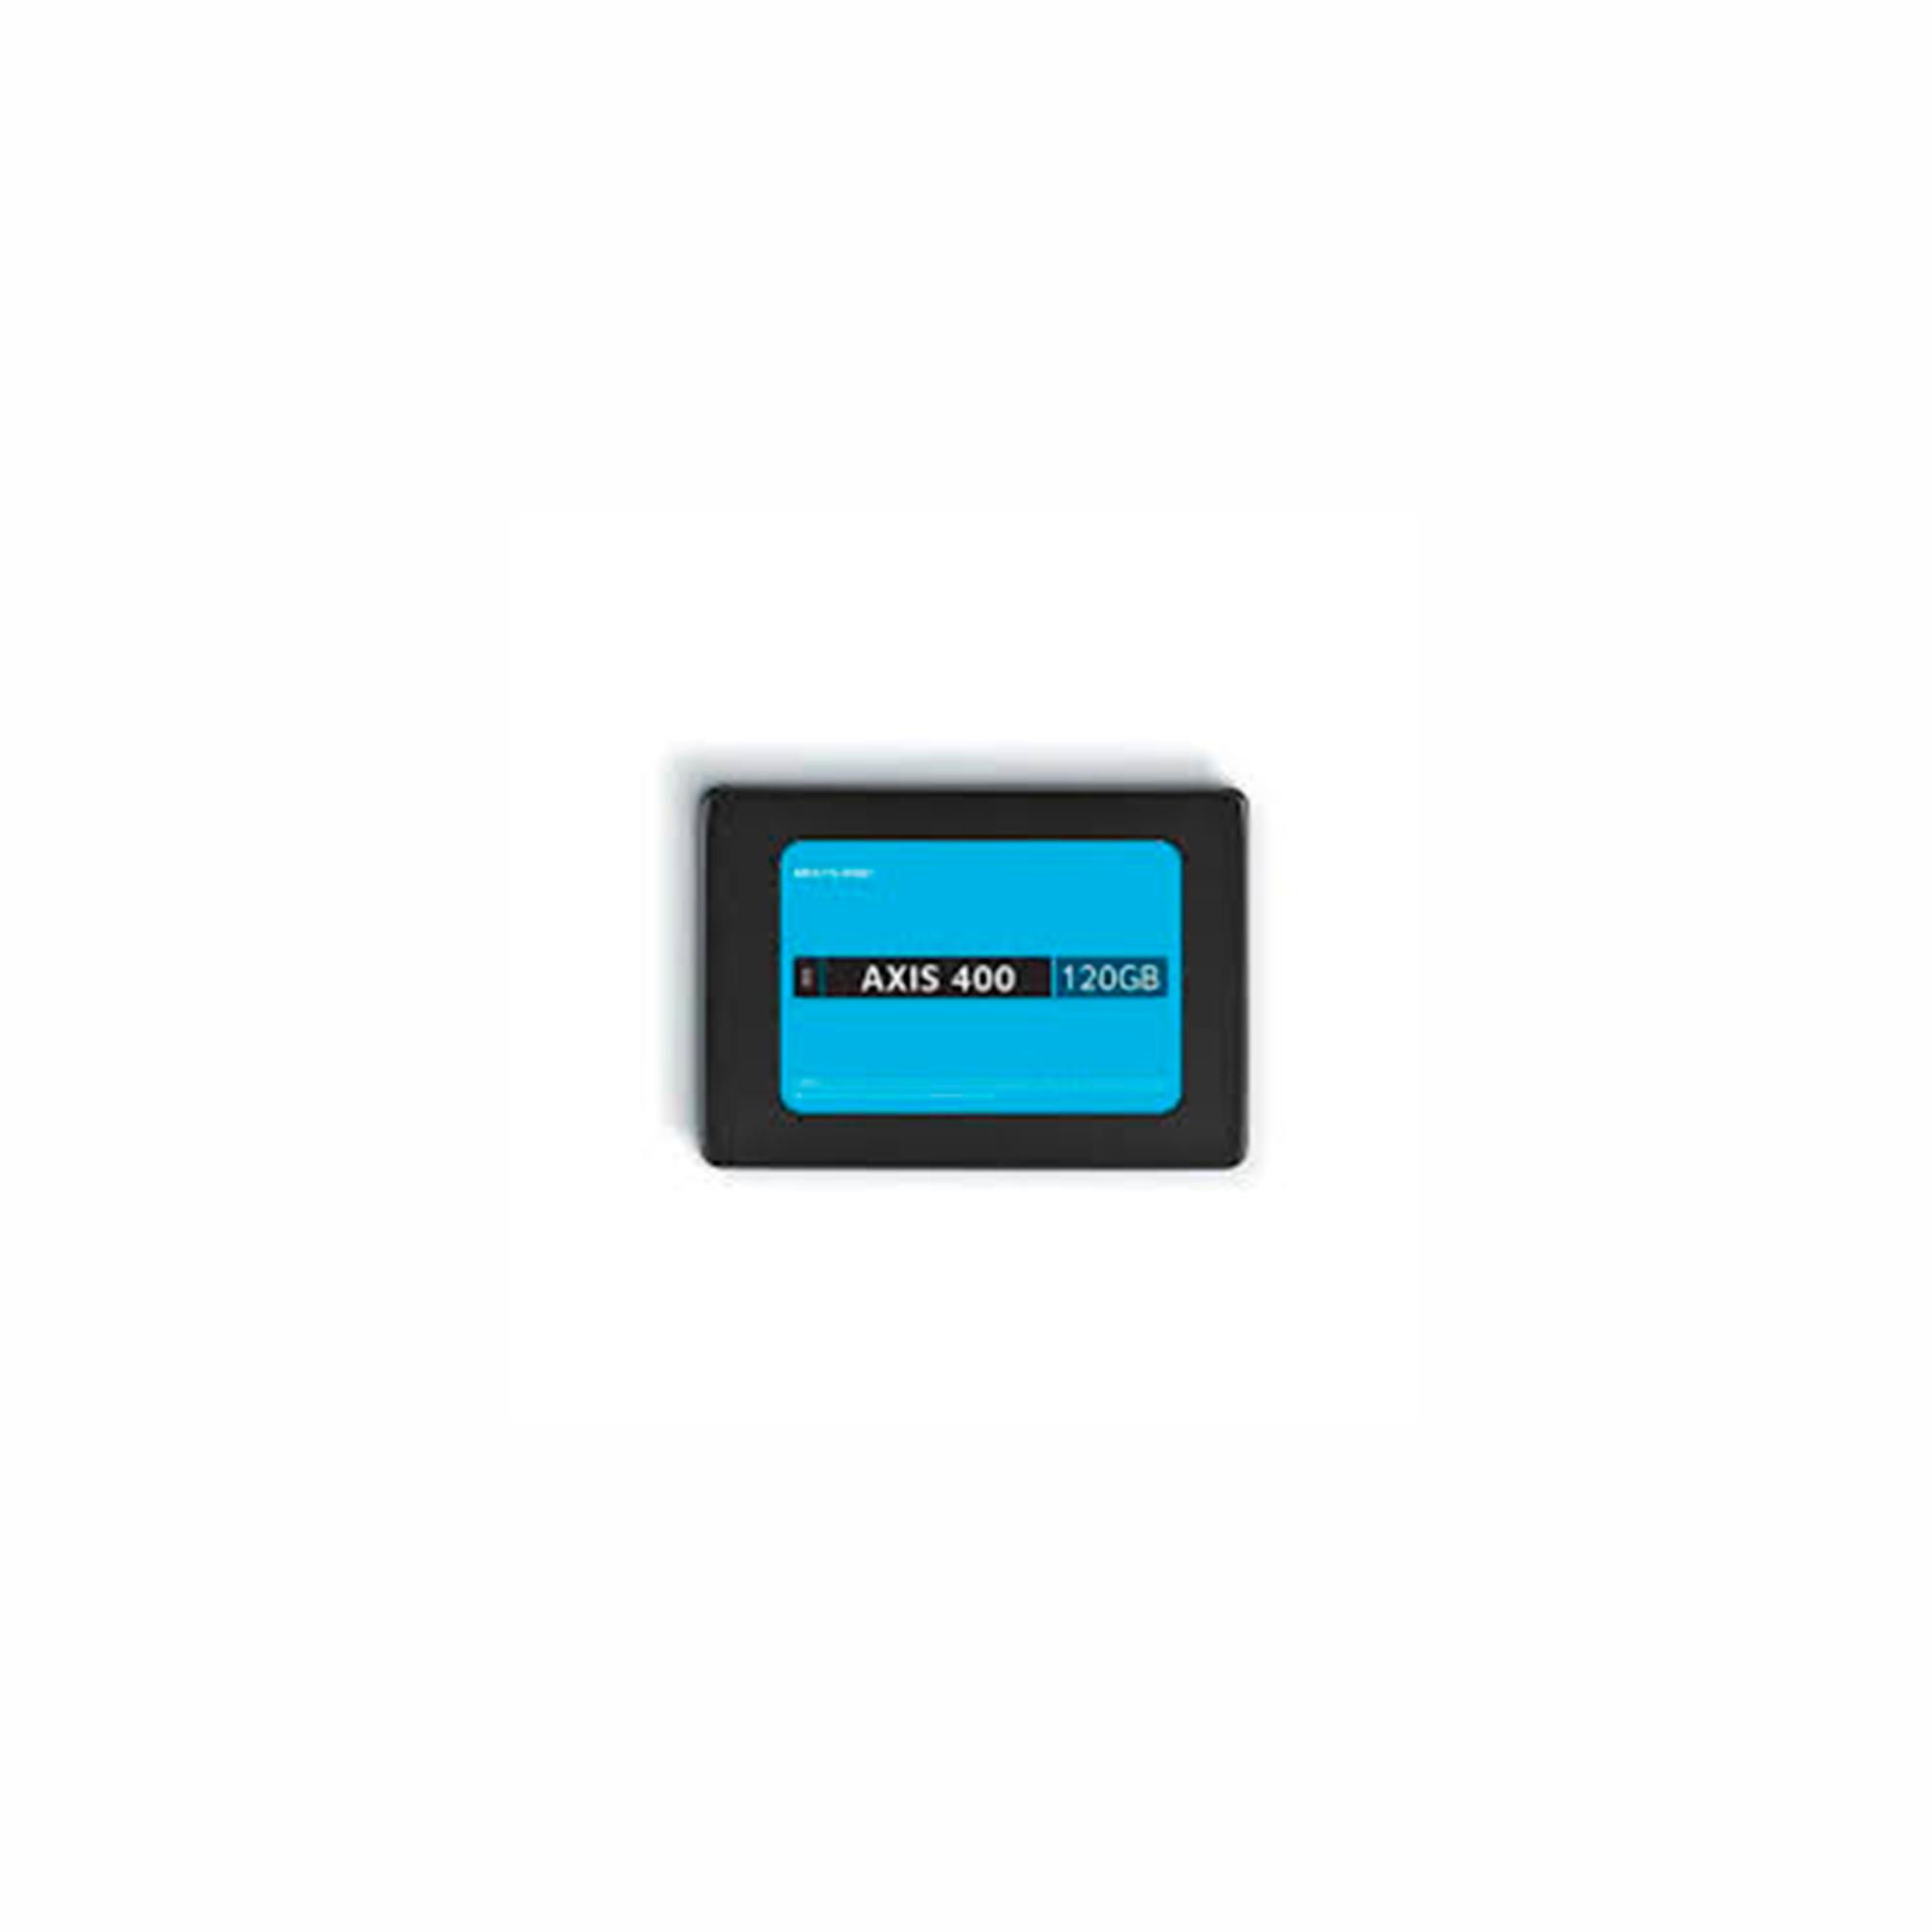 HD SSD 120GB AXIX 400  SS101 MULTILASER